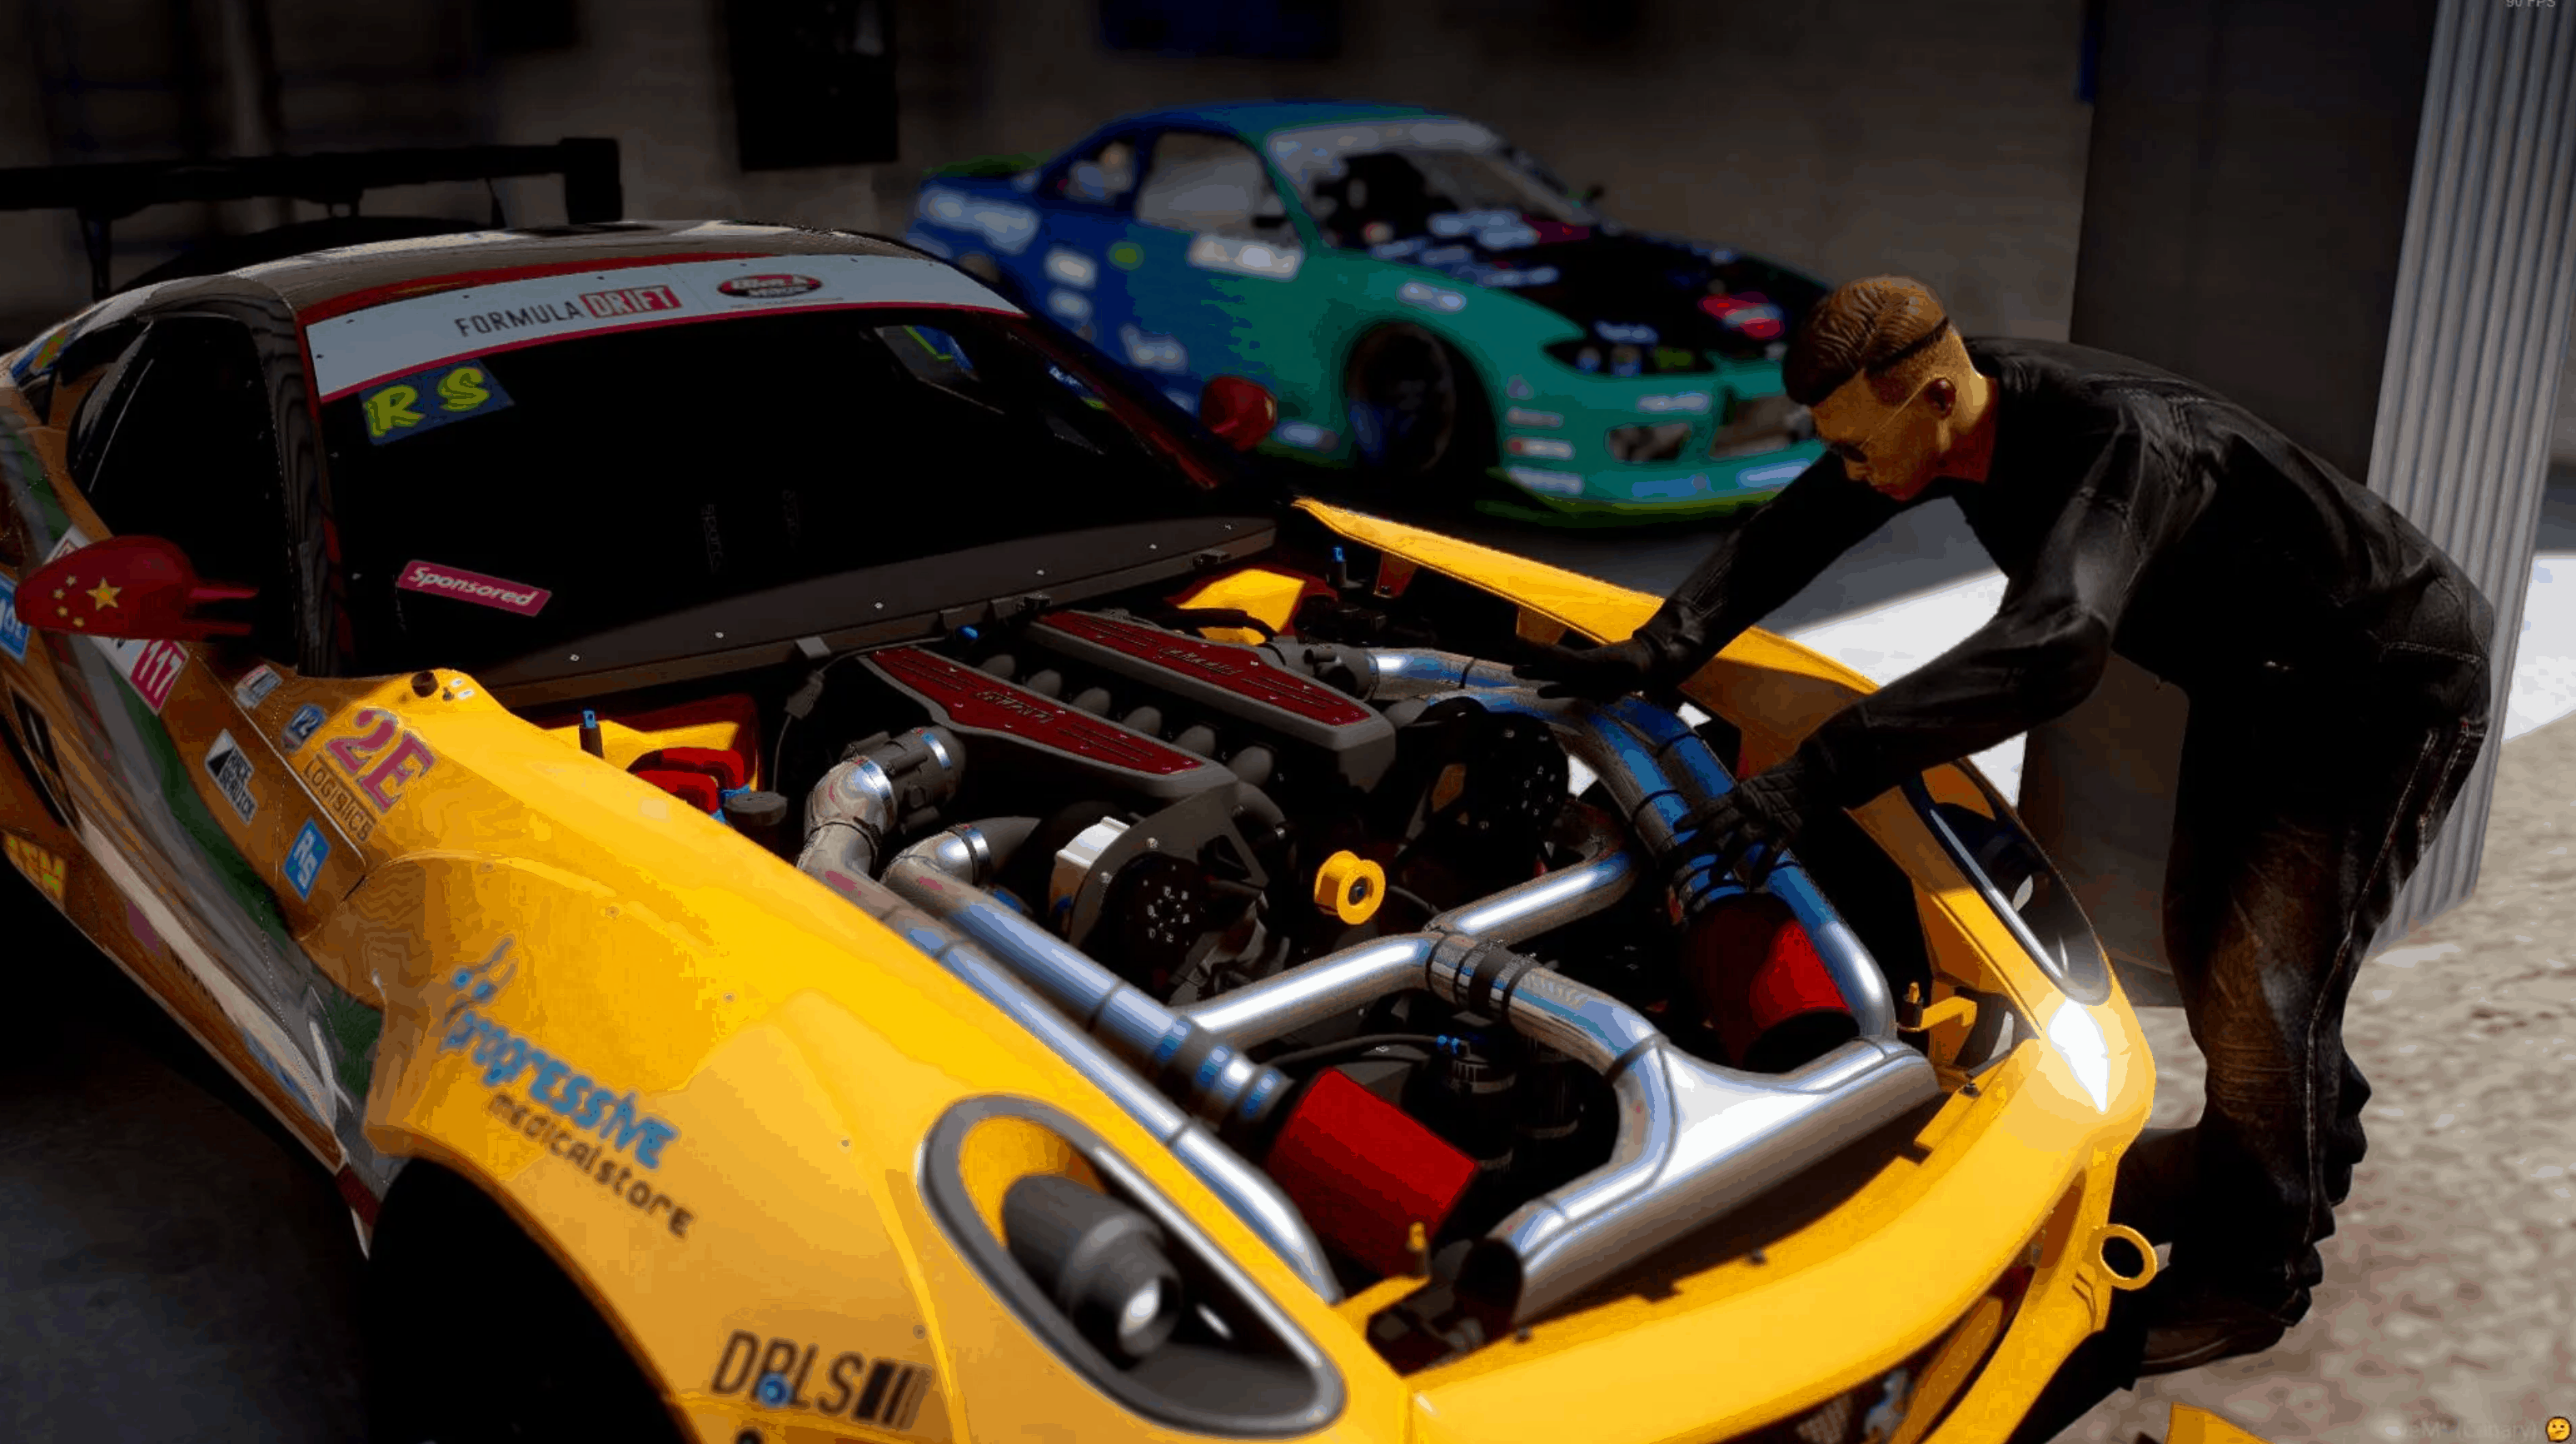 Formula Drift Ferrari 599 Gtb Fiorano 1 0 Gta 5 Mod Grand Theft Auto 5 Mod